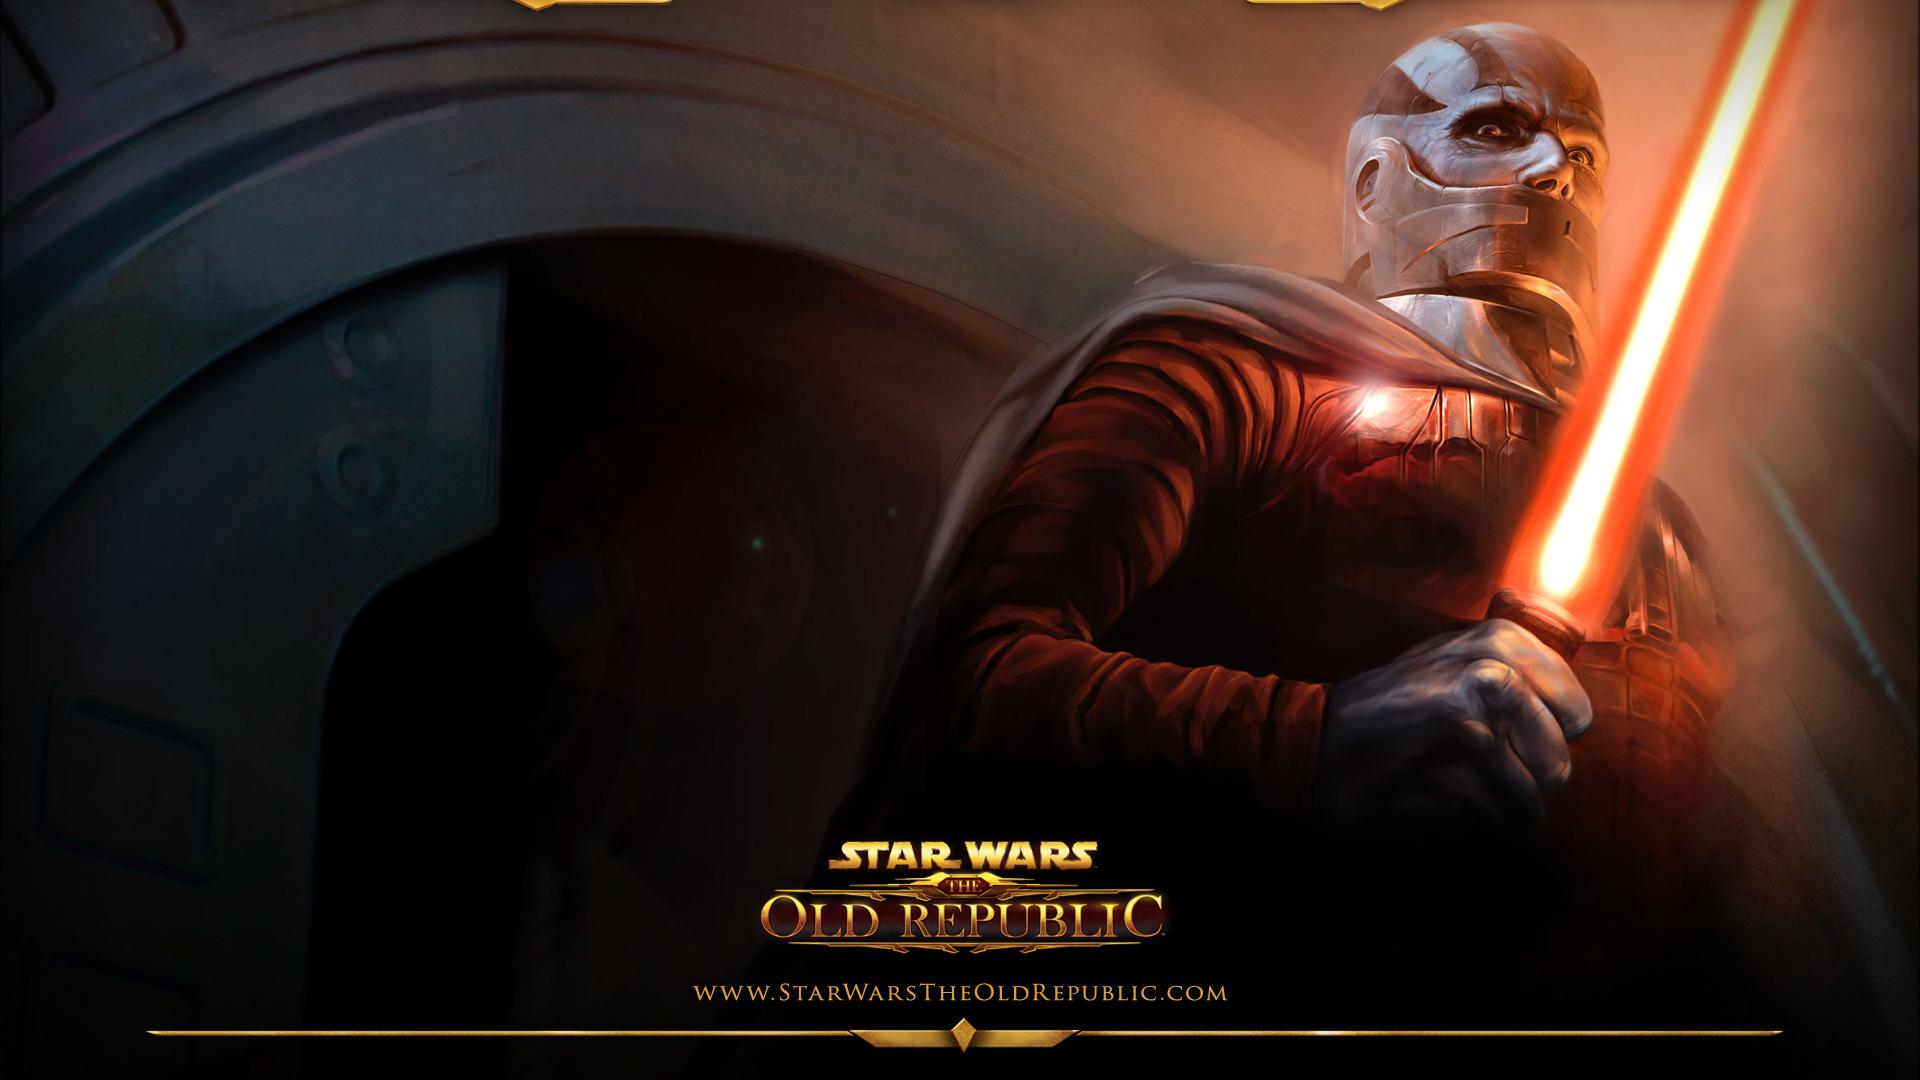 Free Star Wars: The Old Republic Wallpaper in 1920x1080